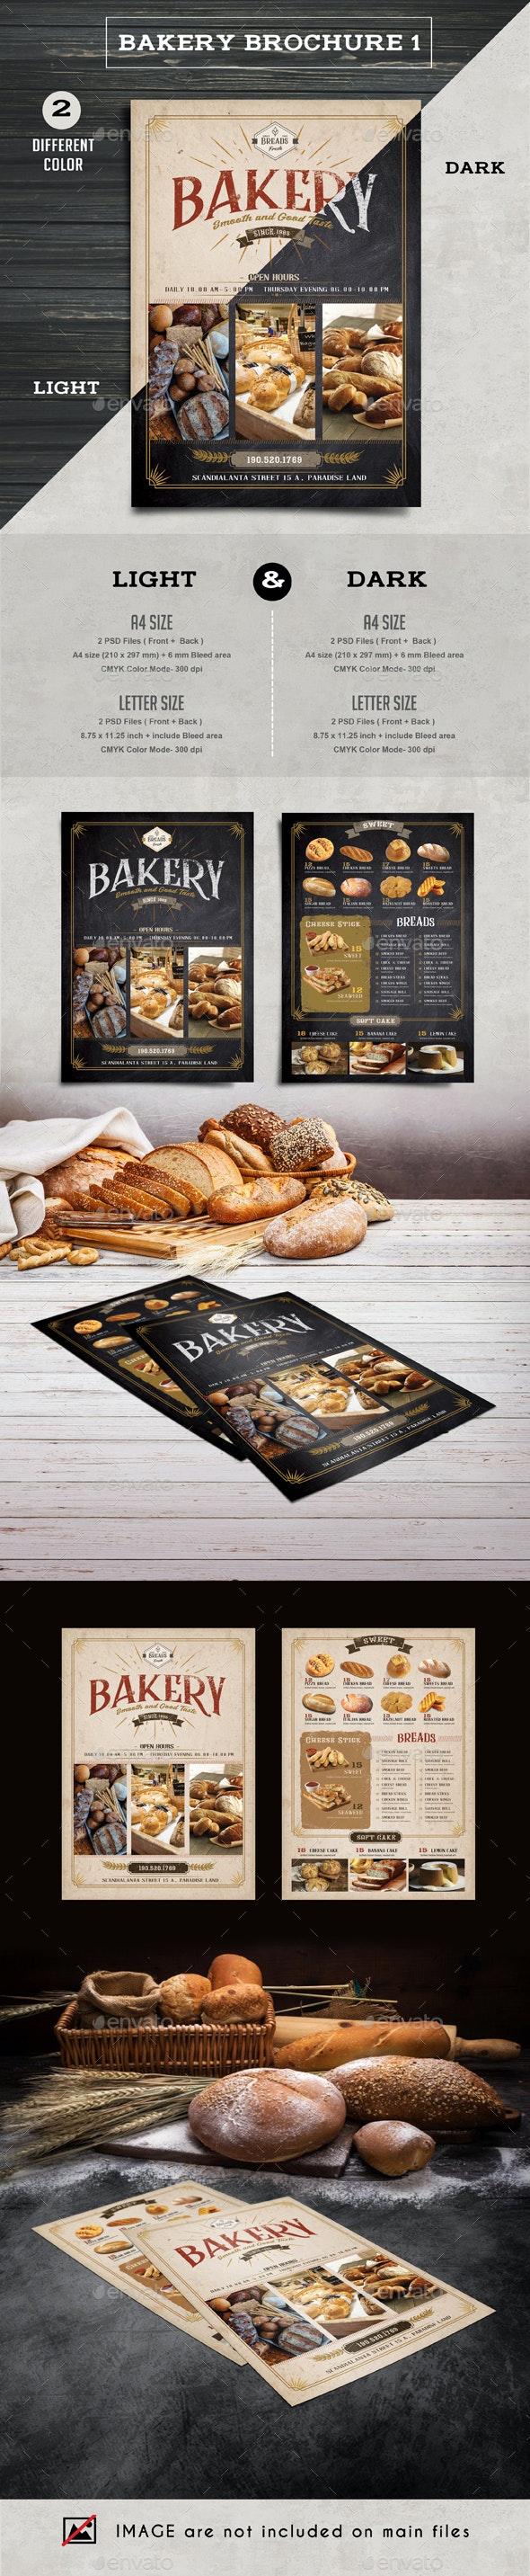 Bakery Brochure 1 - Print Product Mock-Ups